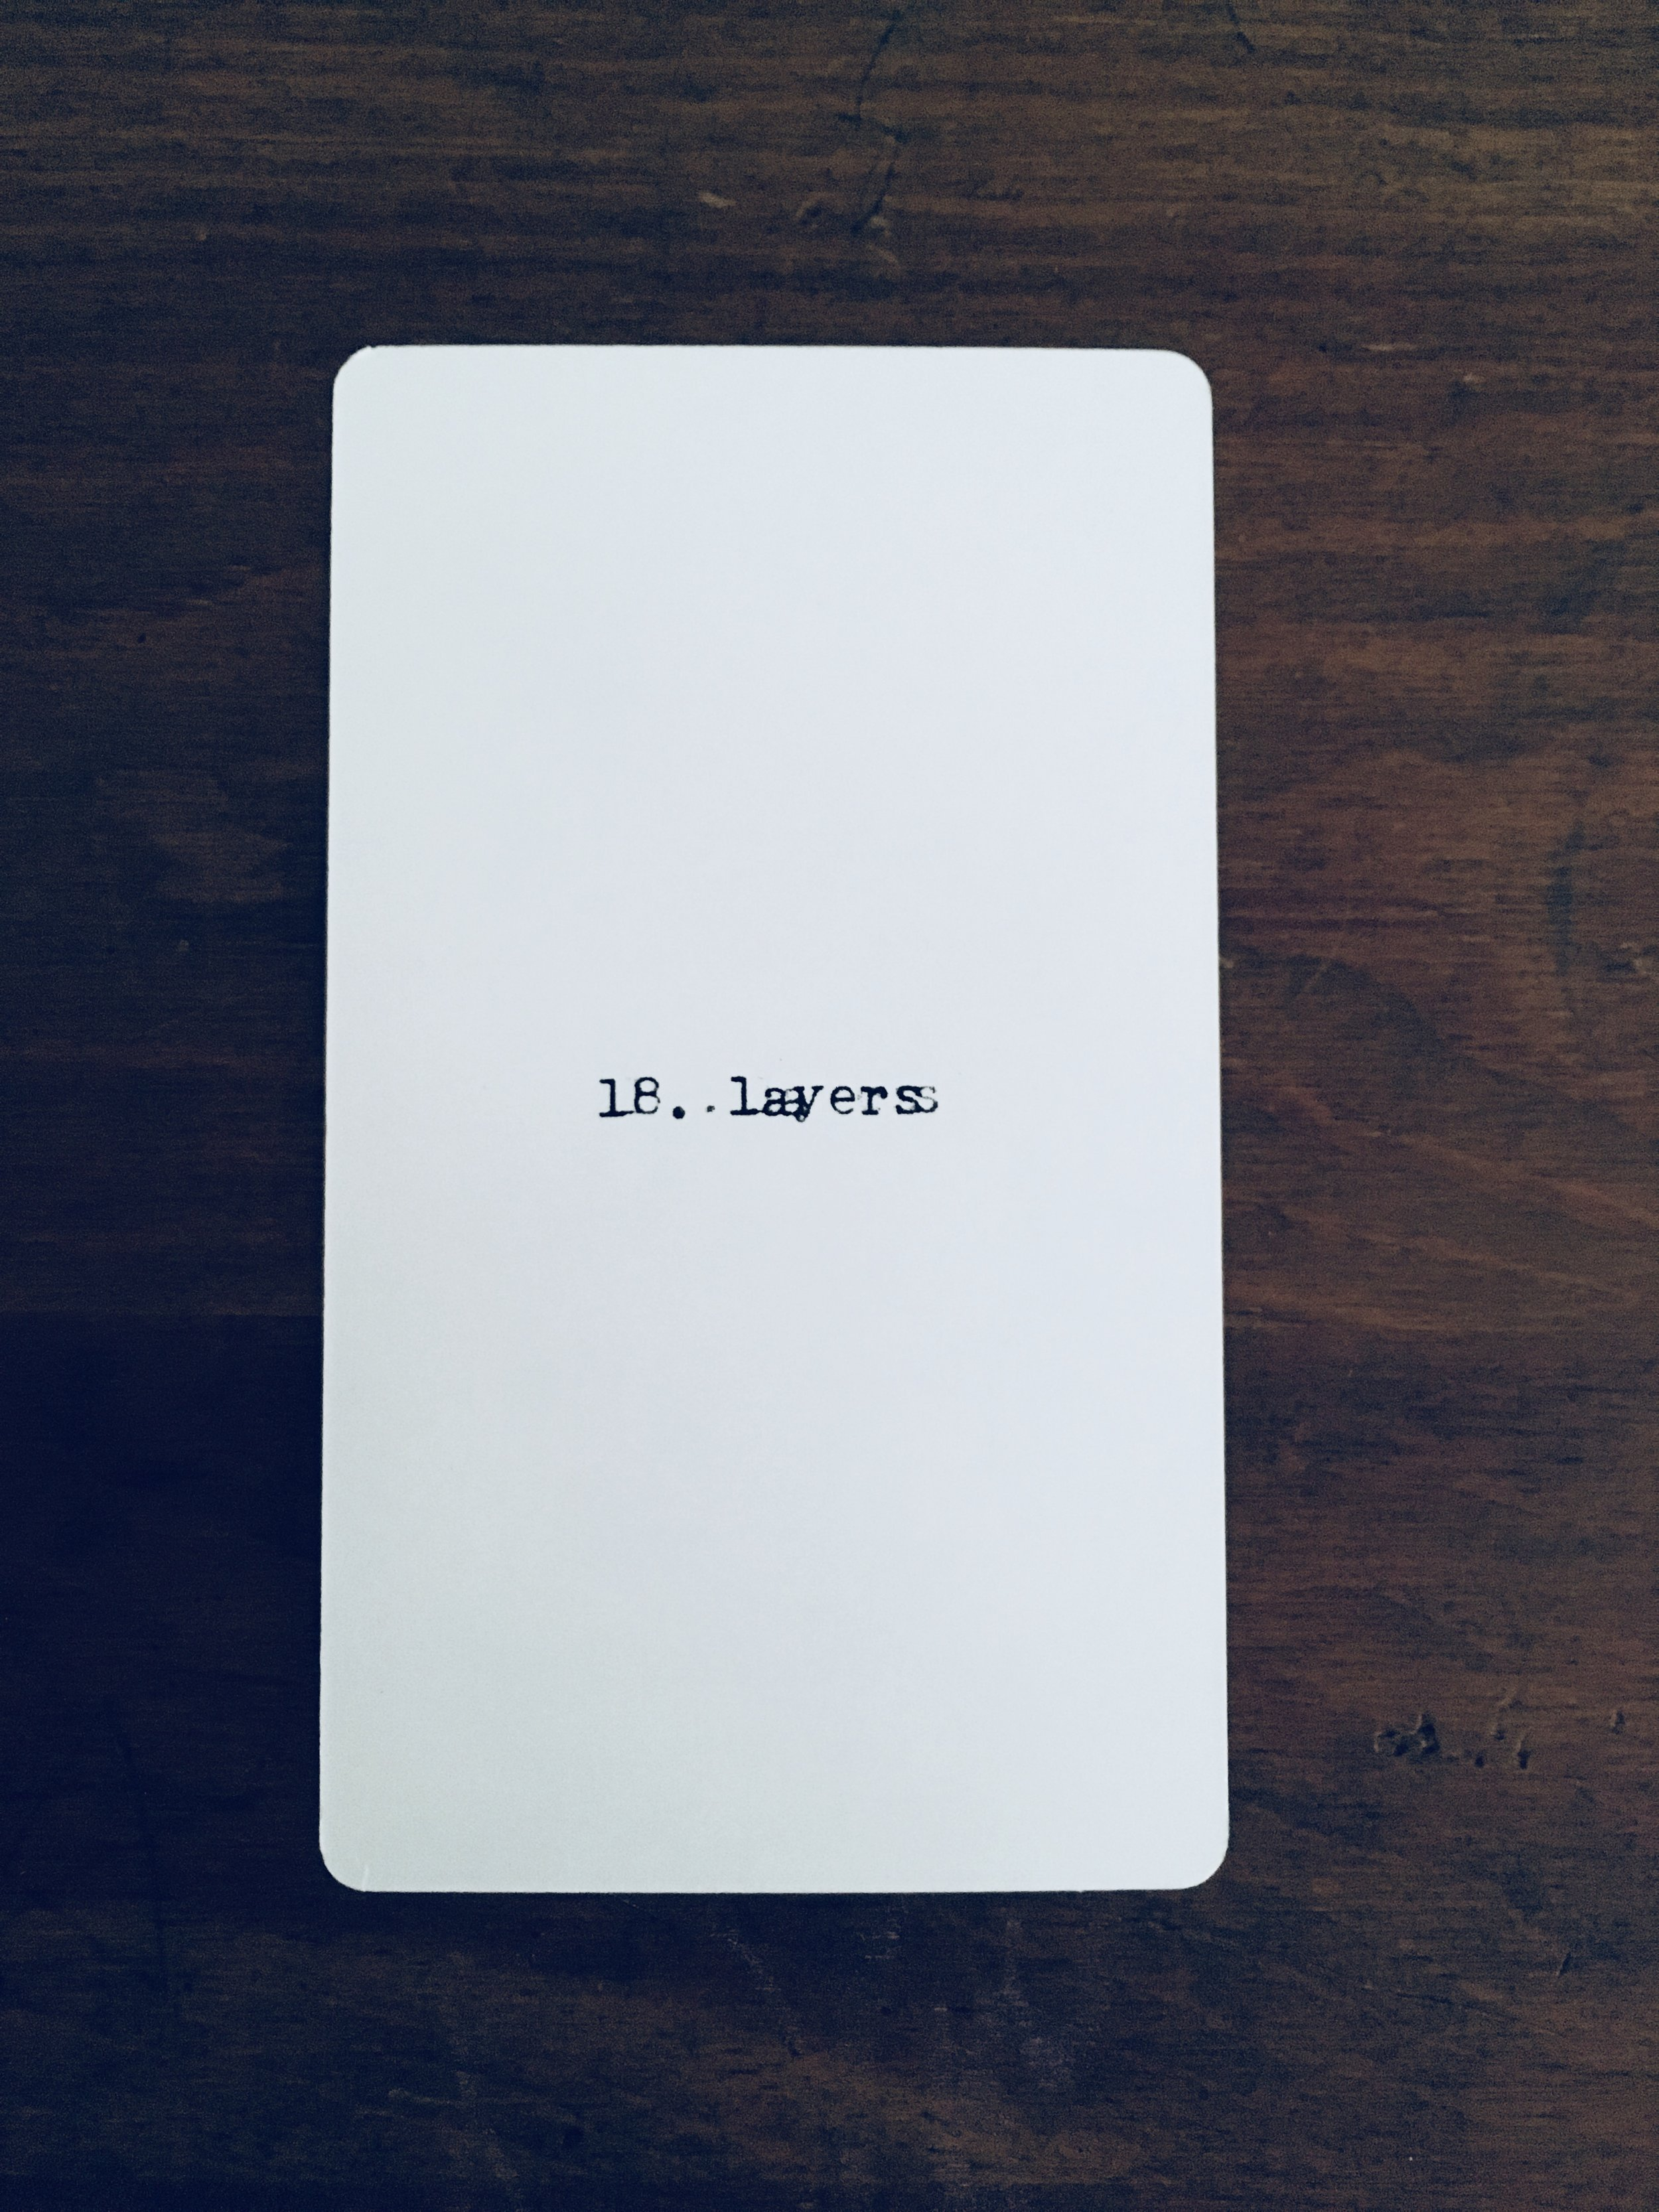 Sagittarius: 18. layers